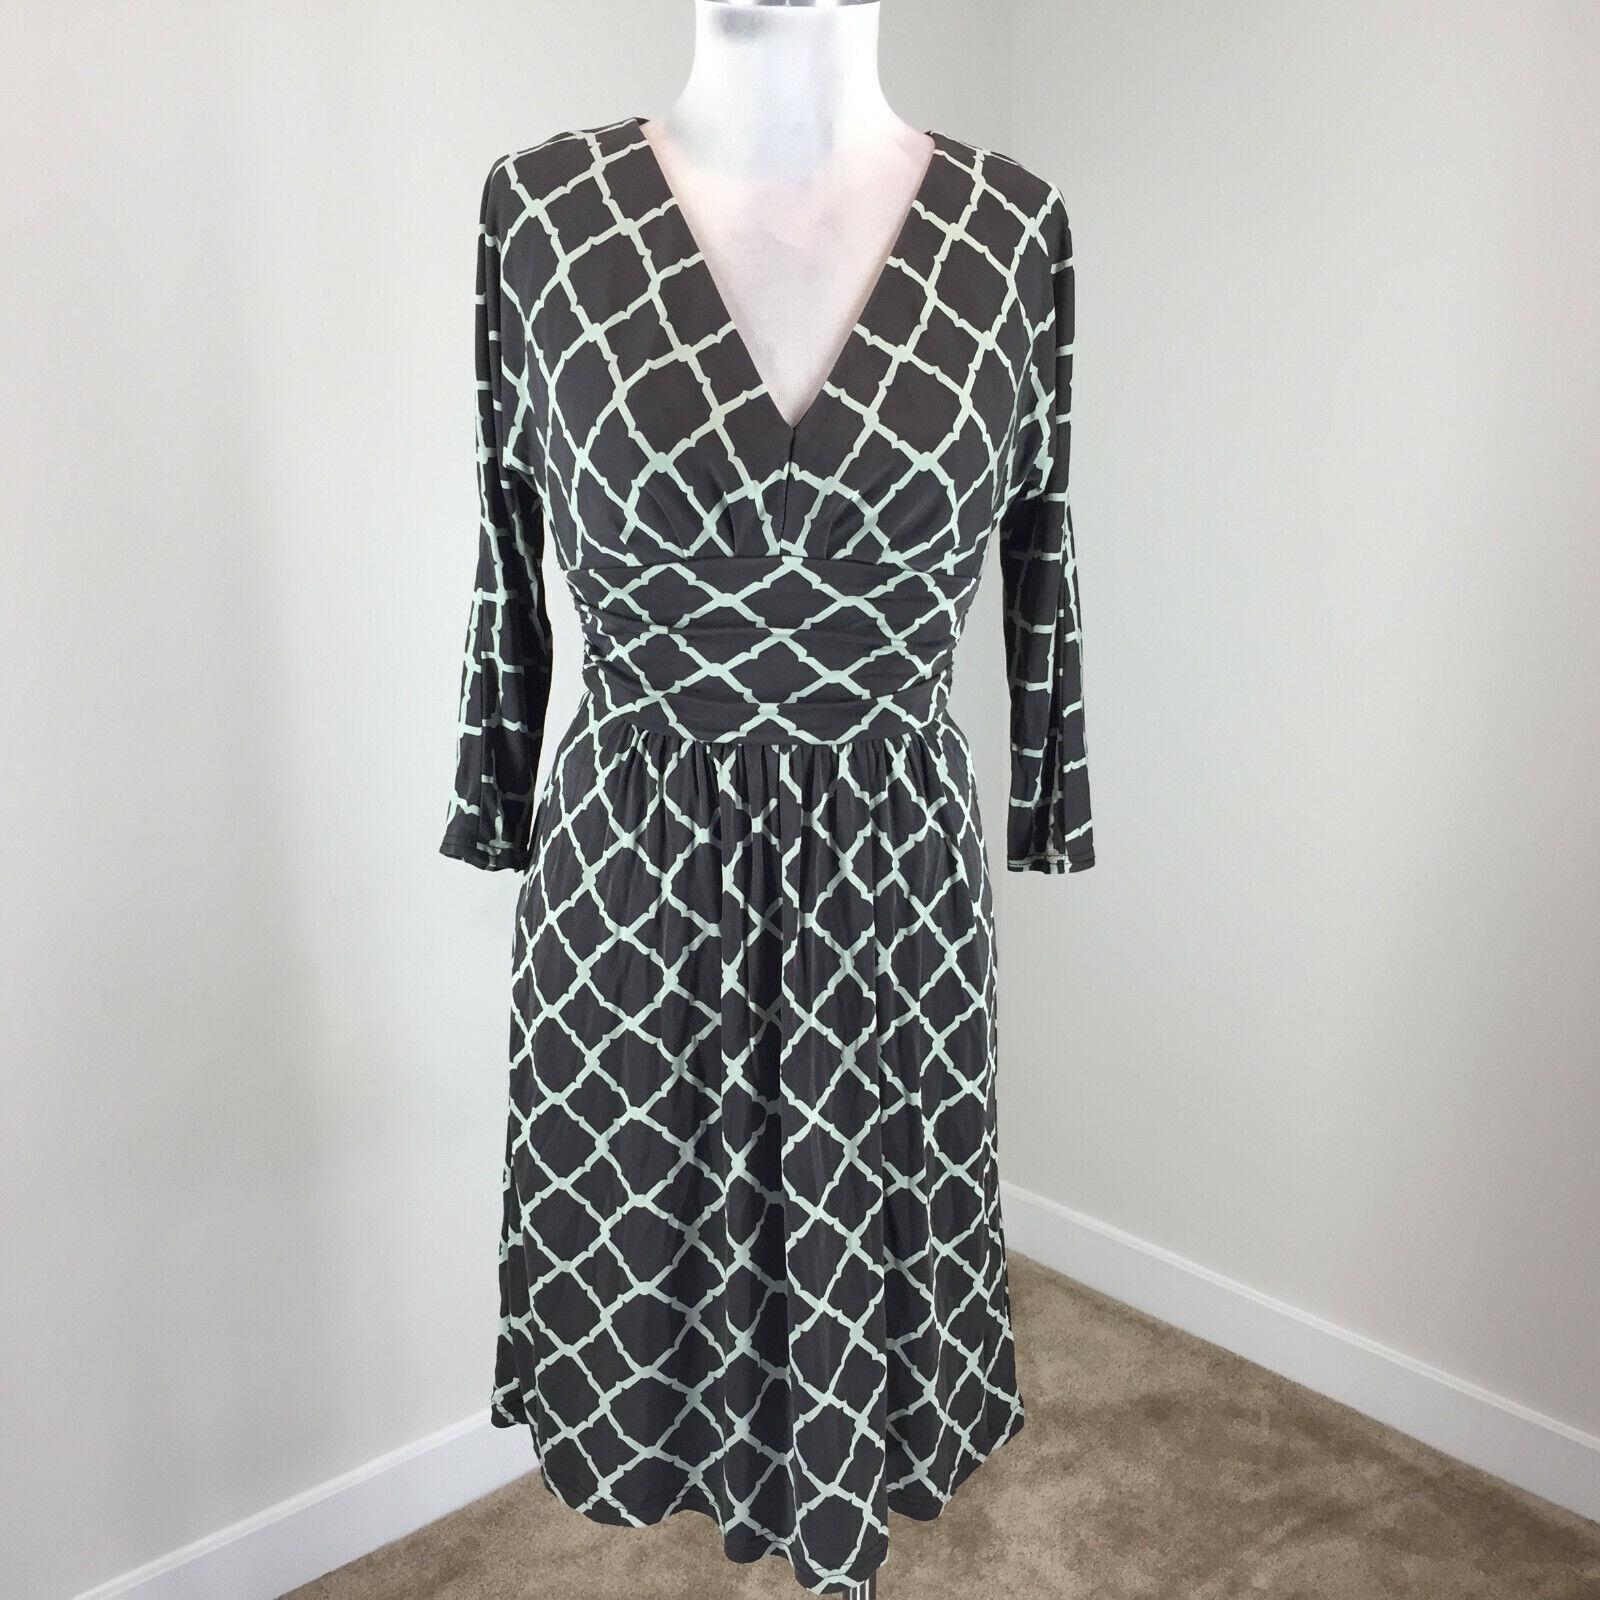 3 Sleeeve Dress 2 Kay Knit Jersey Flare Brown 4 Silk Unger Medallion YfvIb6ym7g